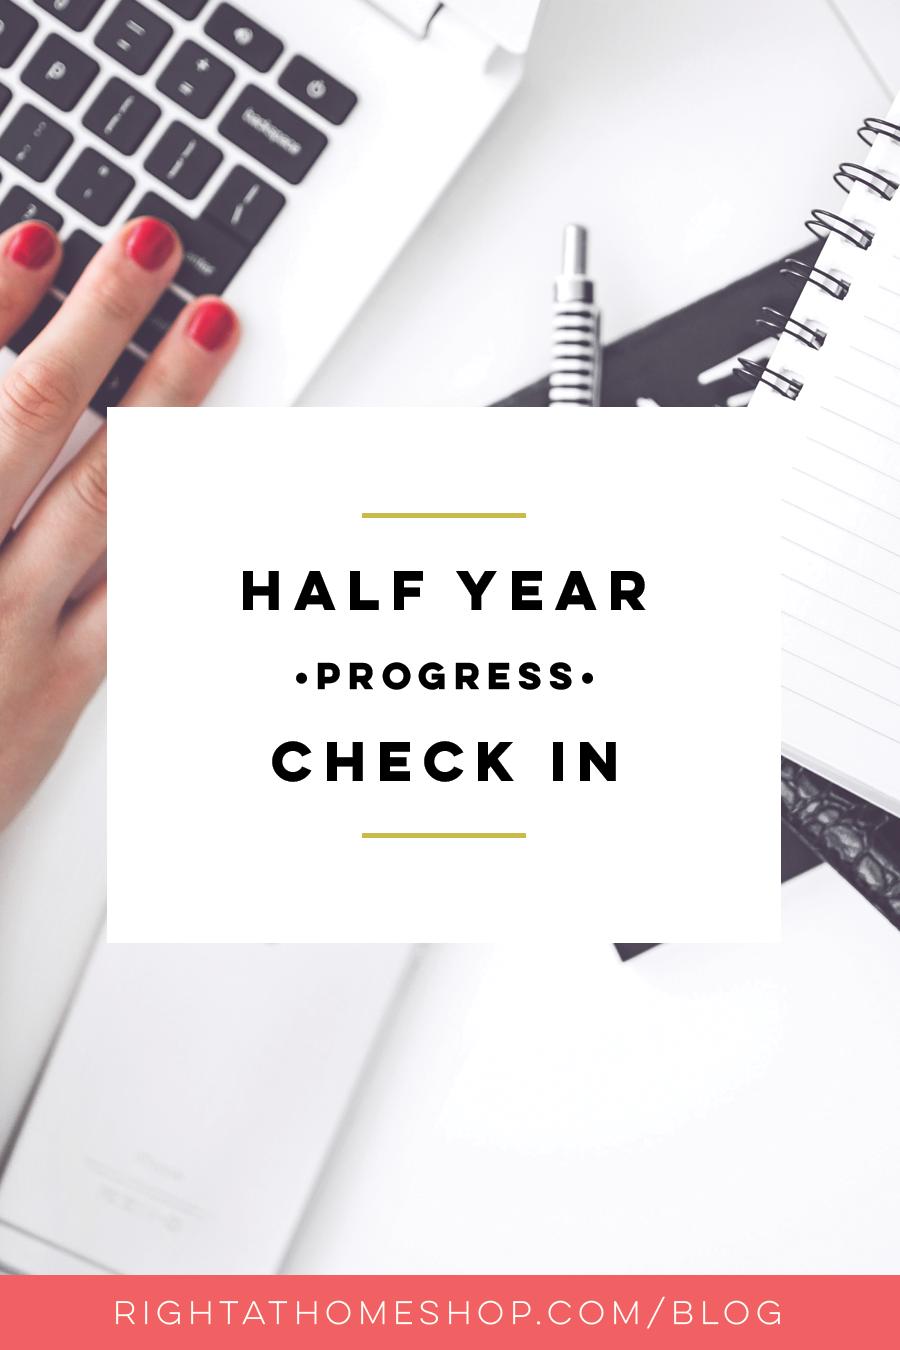 Half Year Progress Check In // July 2016 - rightathomeshop.com/blog